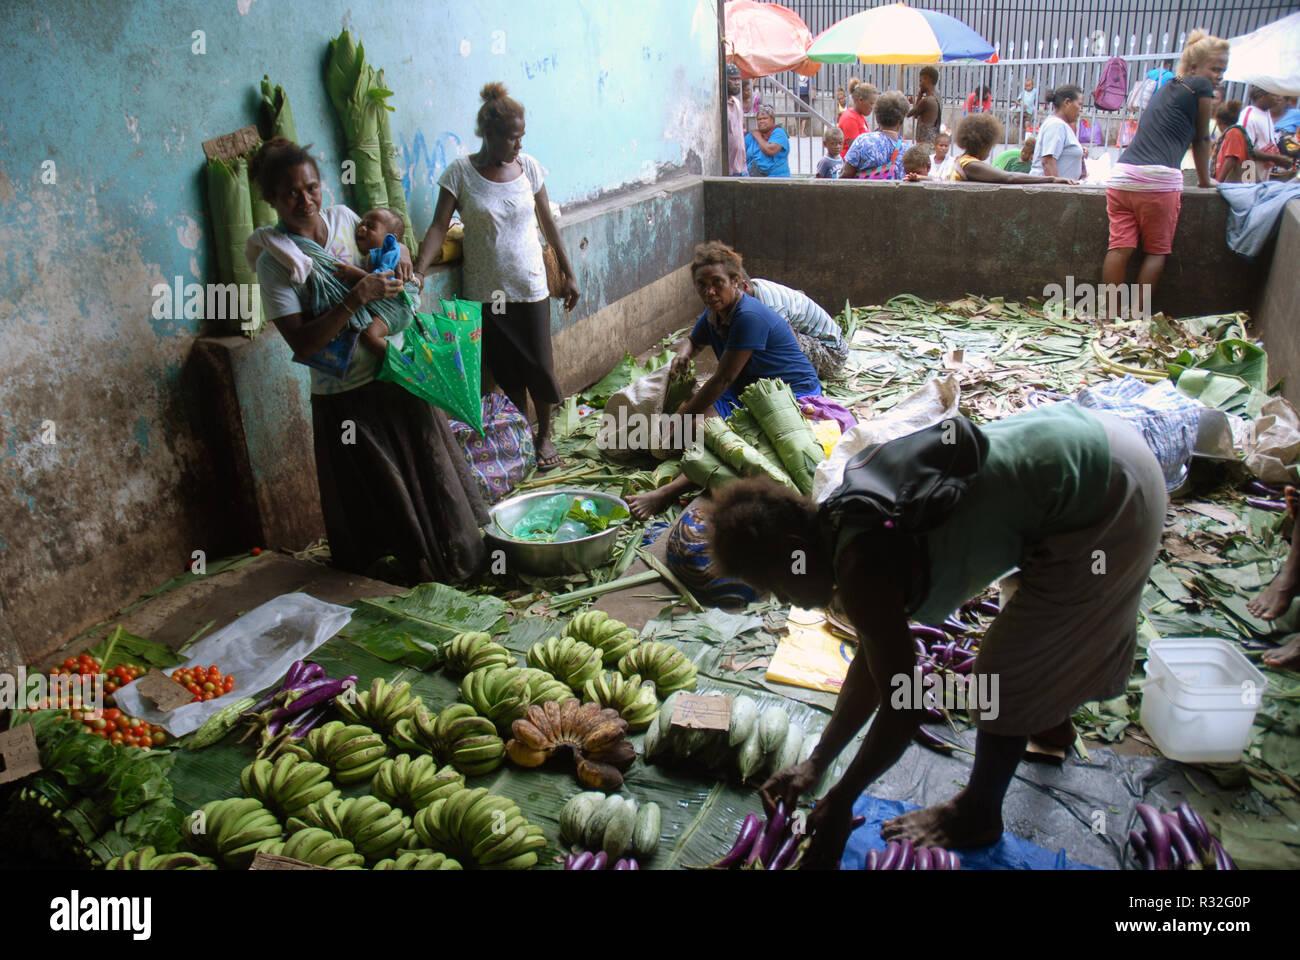 Selling fruit and vegetables at Honiara Central Market, Honiara, Solomon Islands. - Stock Image